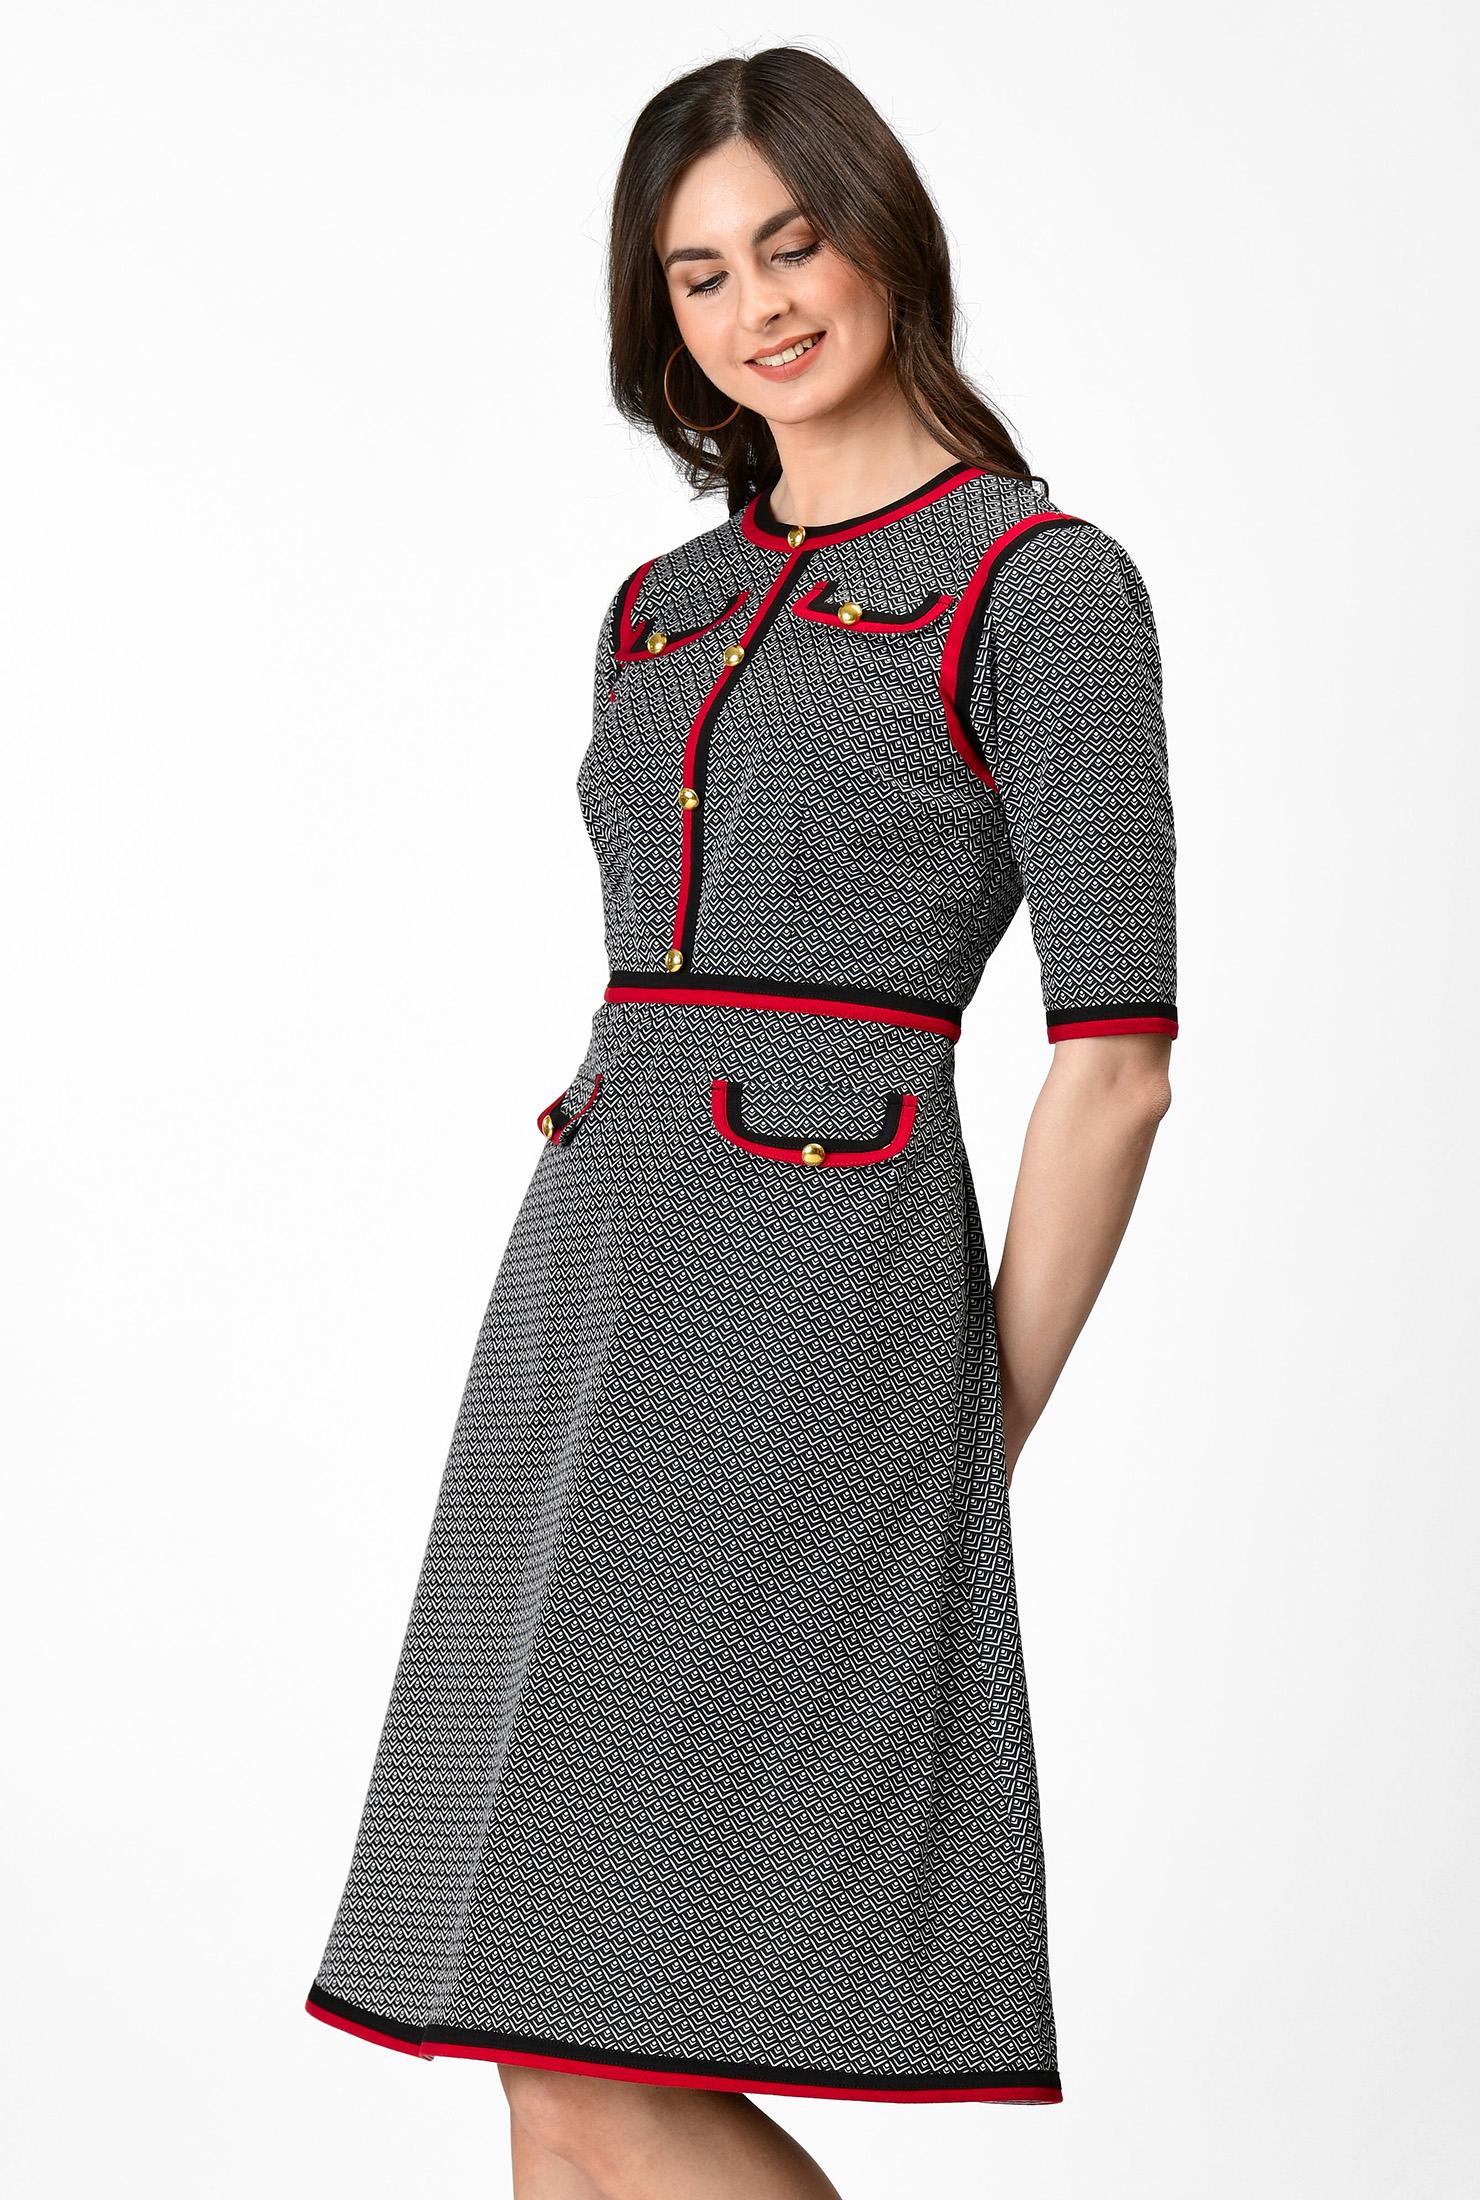 1960s Dresses | 60s Dresses Mod, Mini, Jackie O, Hippie Geo print cotton twill contrast trim A-line dress $74.95 AT vintagedancer.com